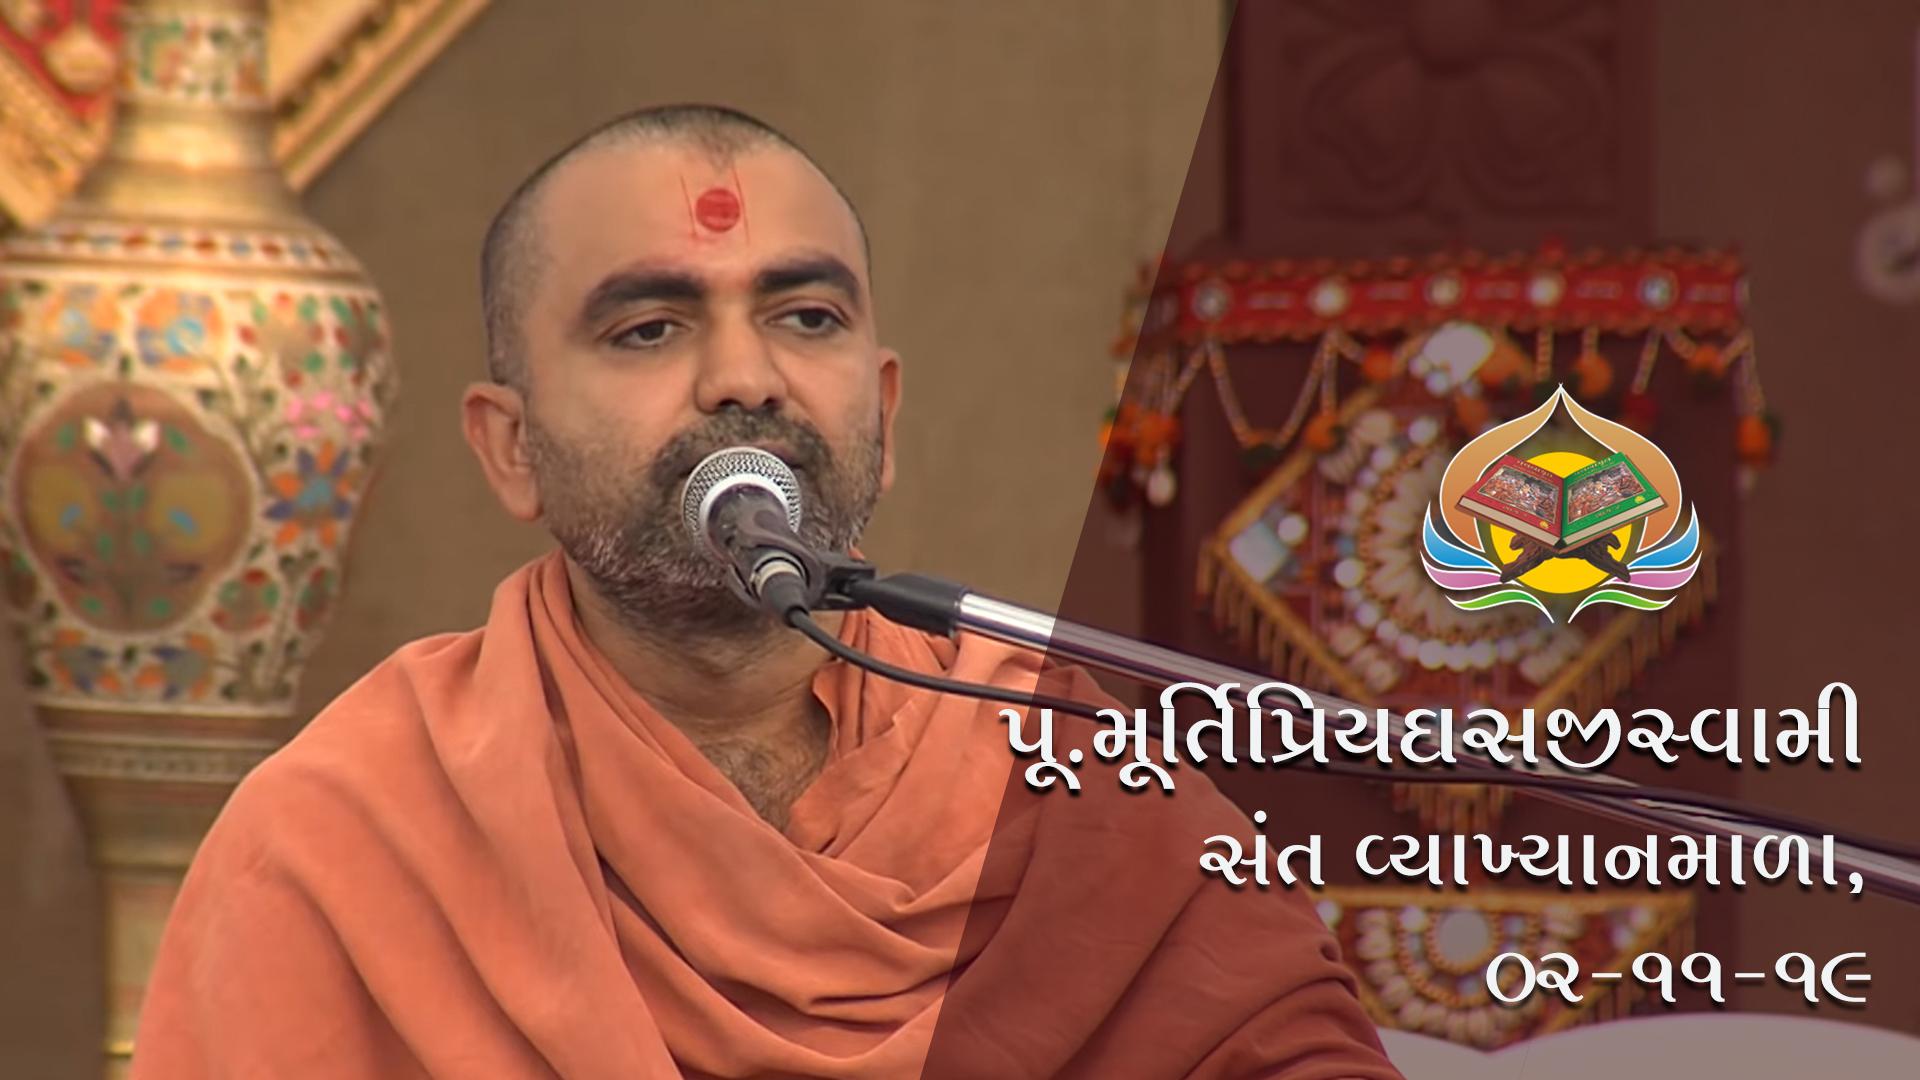 P.Murtipriyadasjiswami | Sant Vyakhyan Mala | Vachanamrut Dwishatabdi Mahotsav & Gyansatra 13